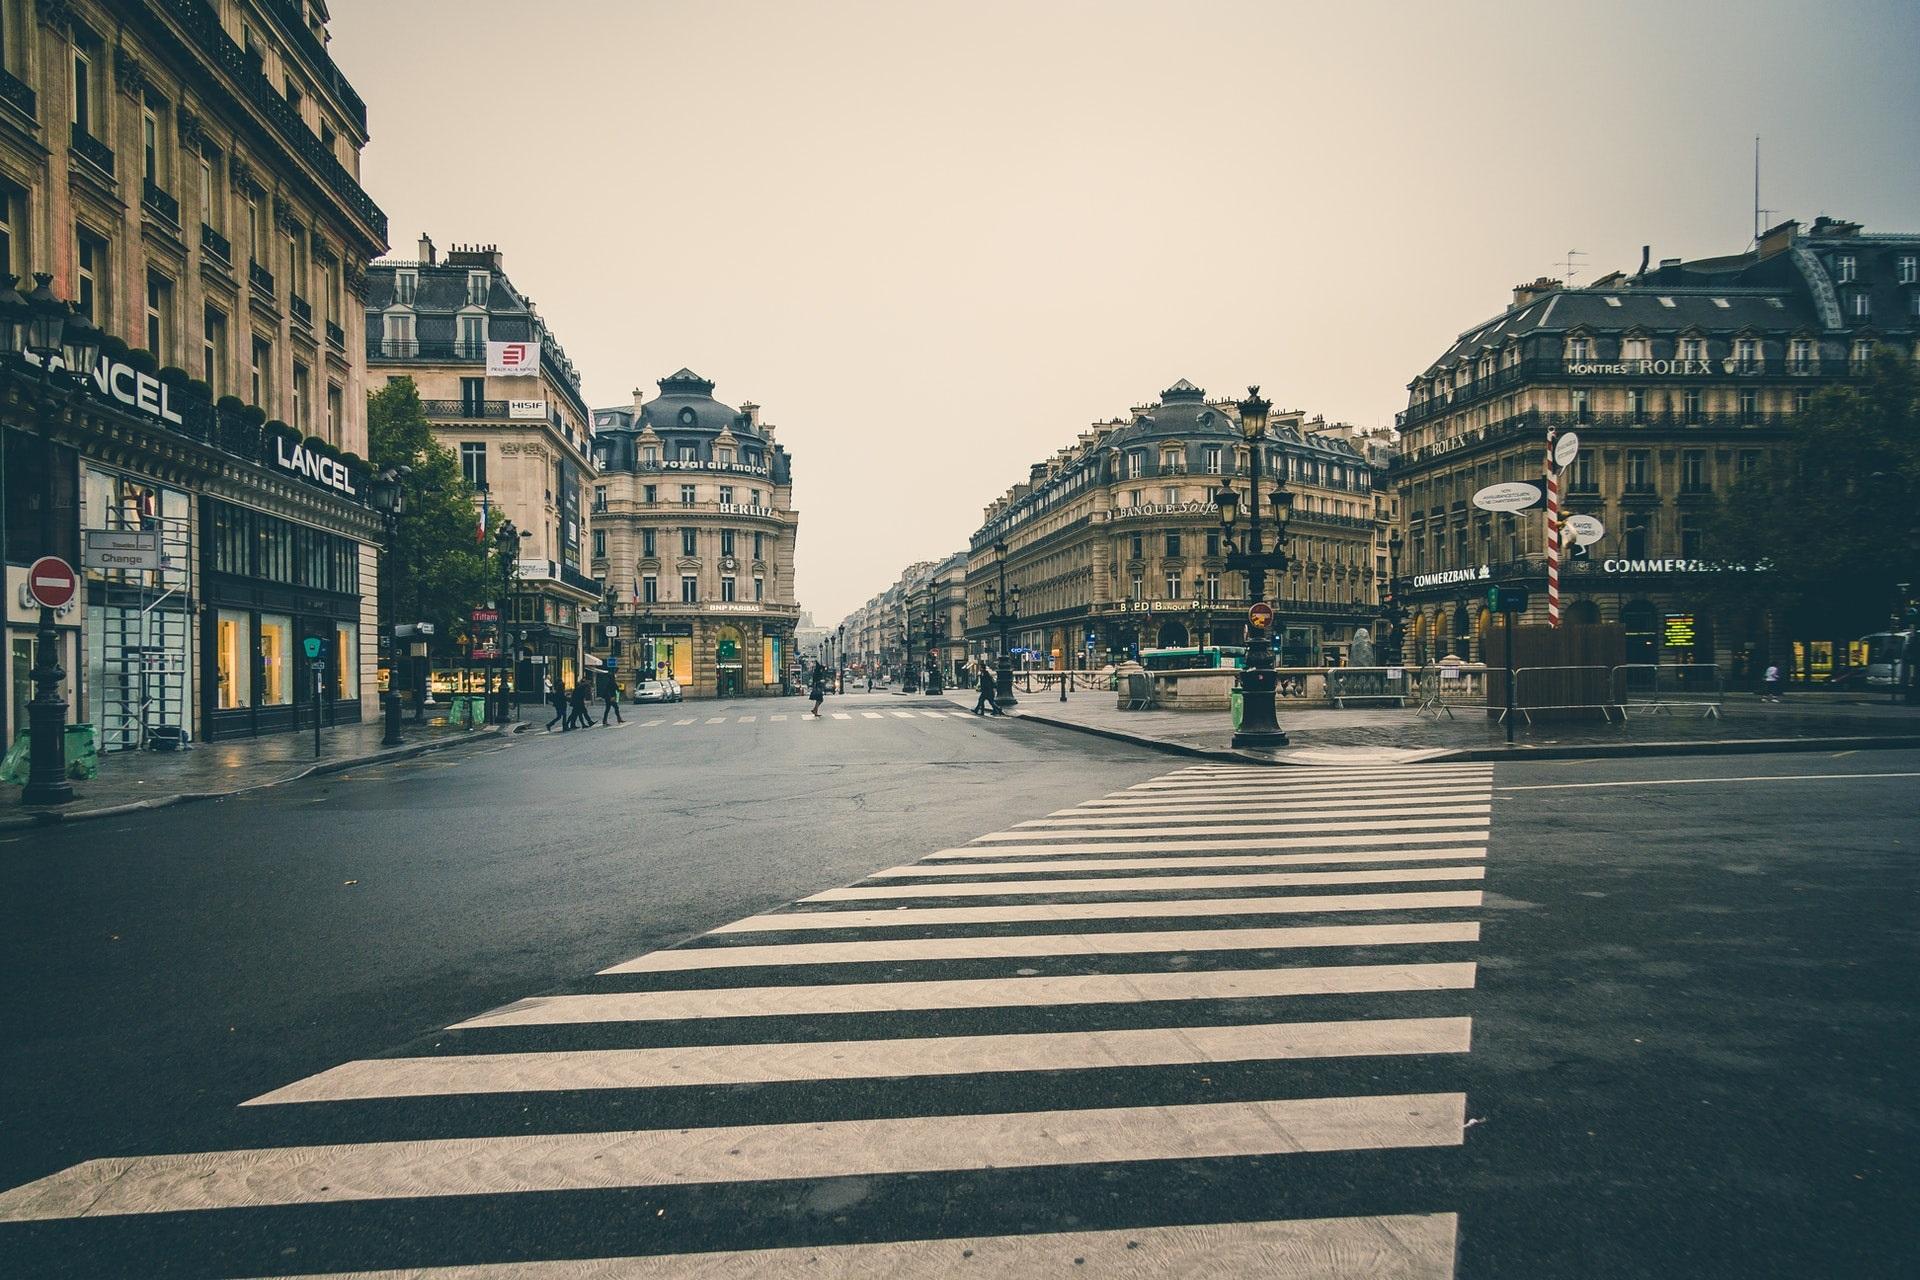 ulica street view